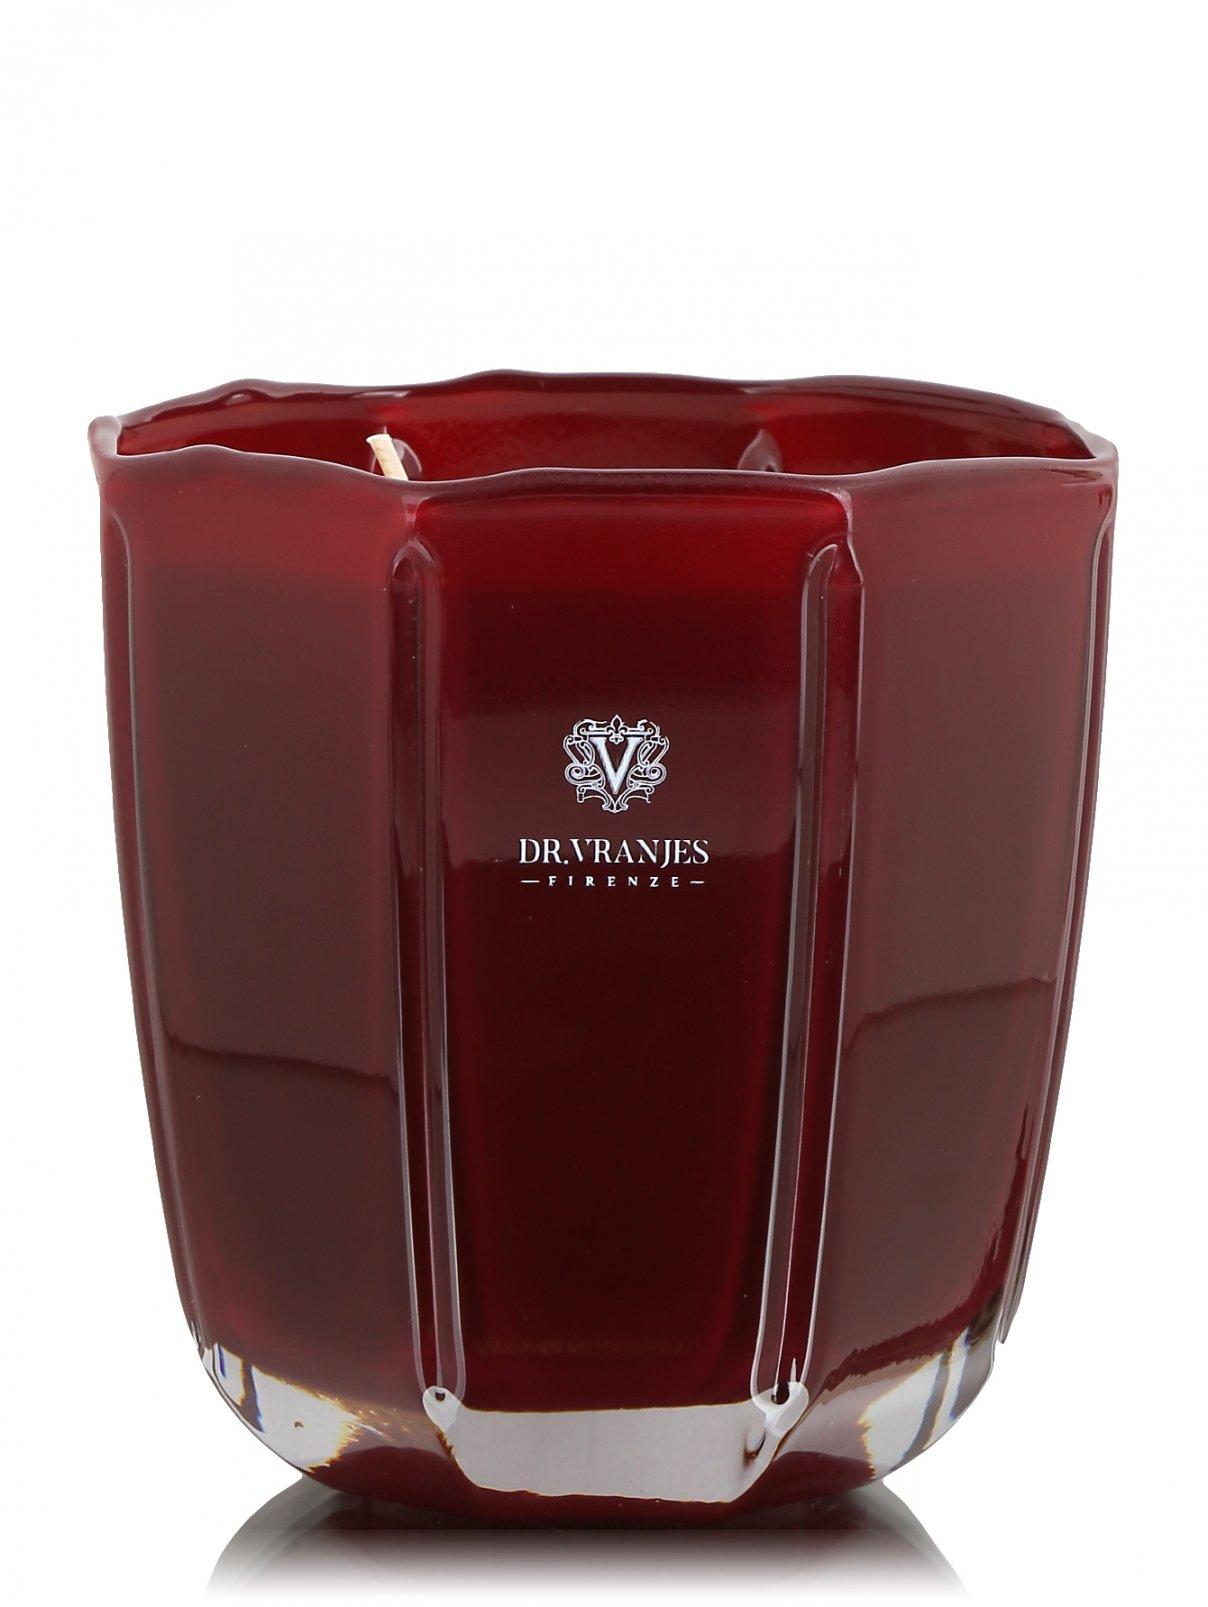 Свеча Rosso Nobile Red Tourmaline 500 г Home Fragrance Dr. Vranjes  –  Общий вид